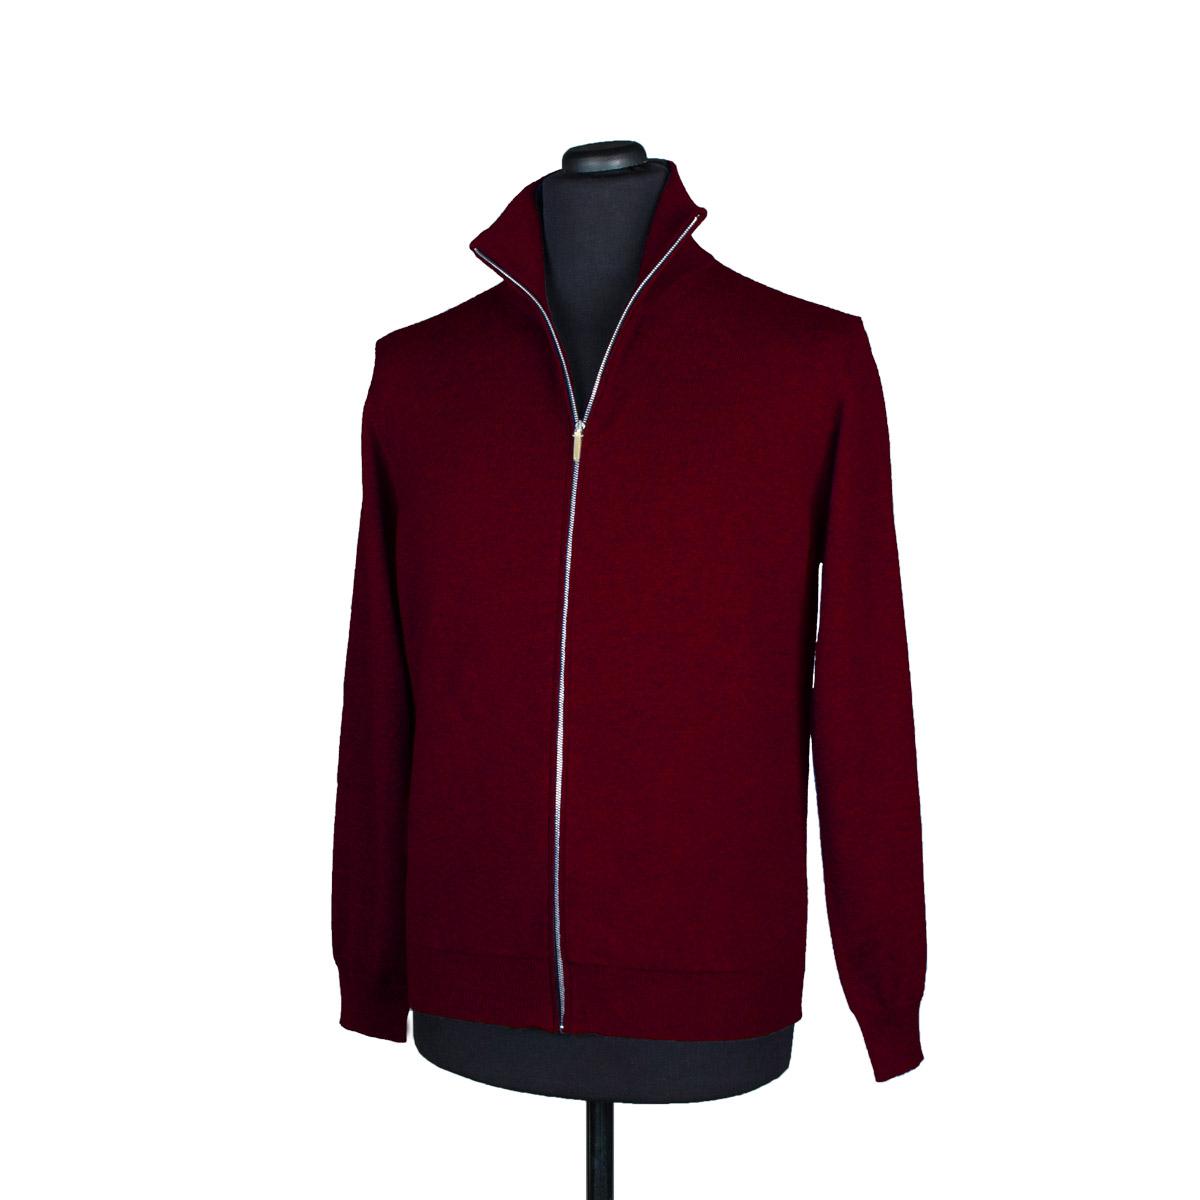 Mens zip up cashmere cardigan, burgundy - DiFranco Moda Italiana